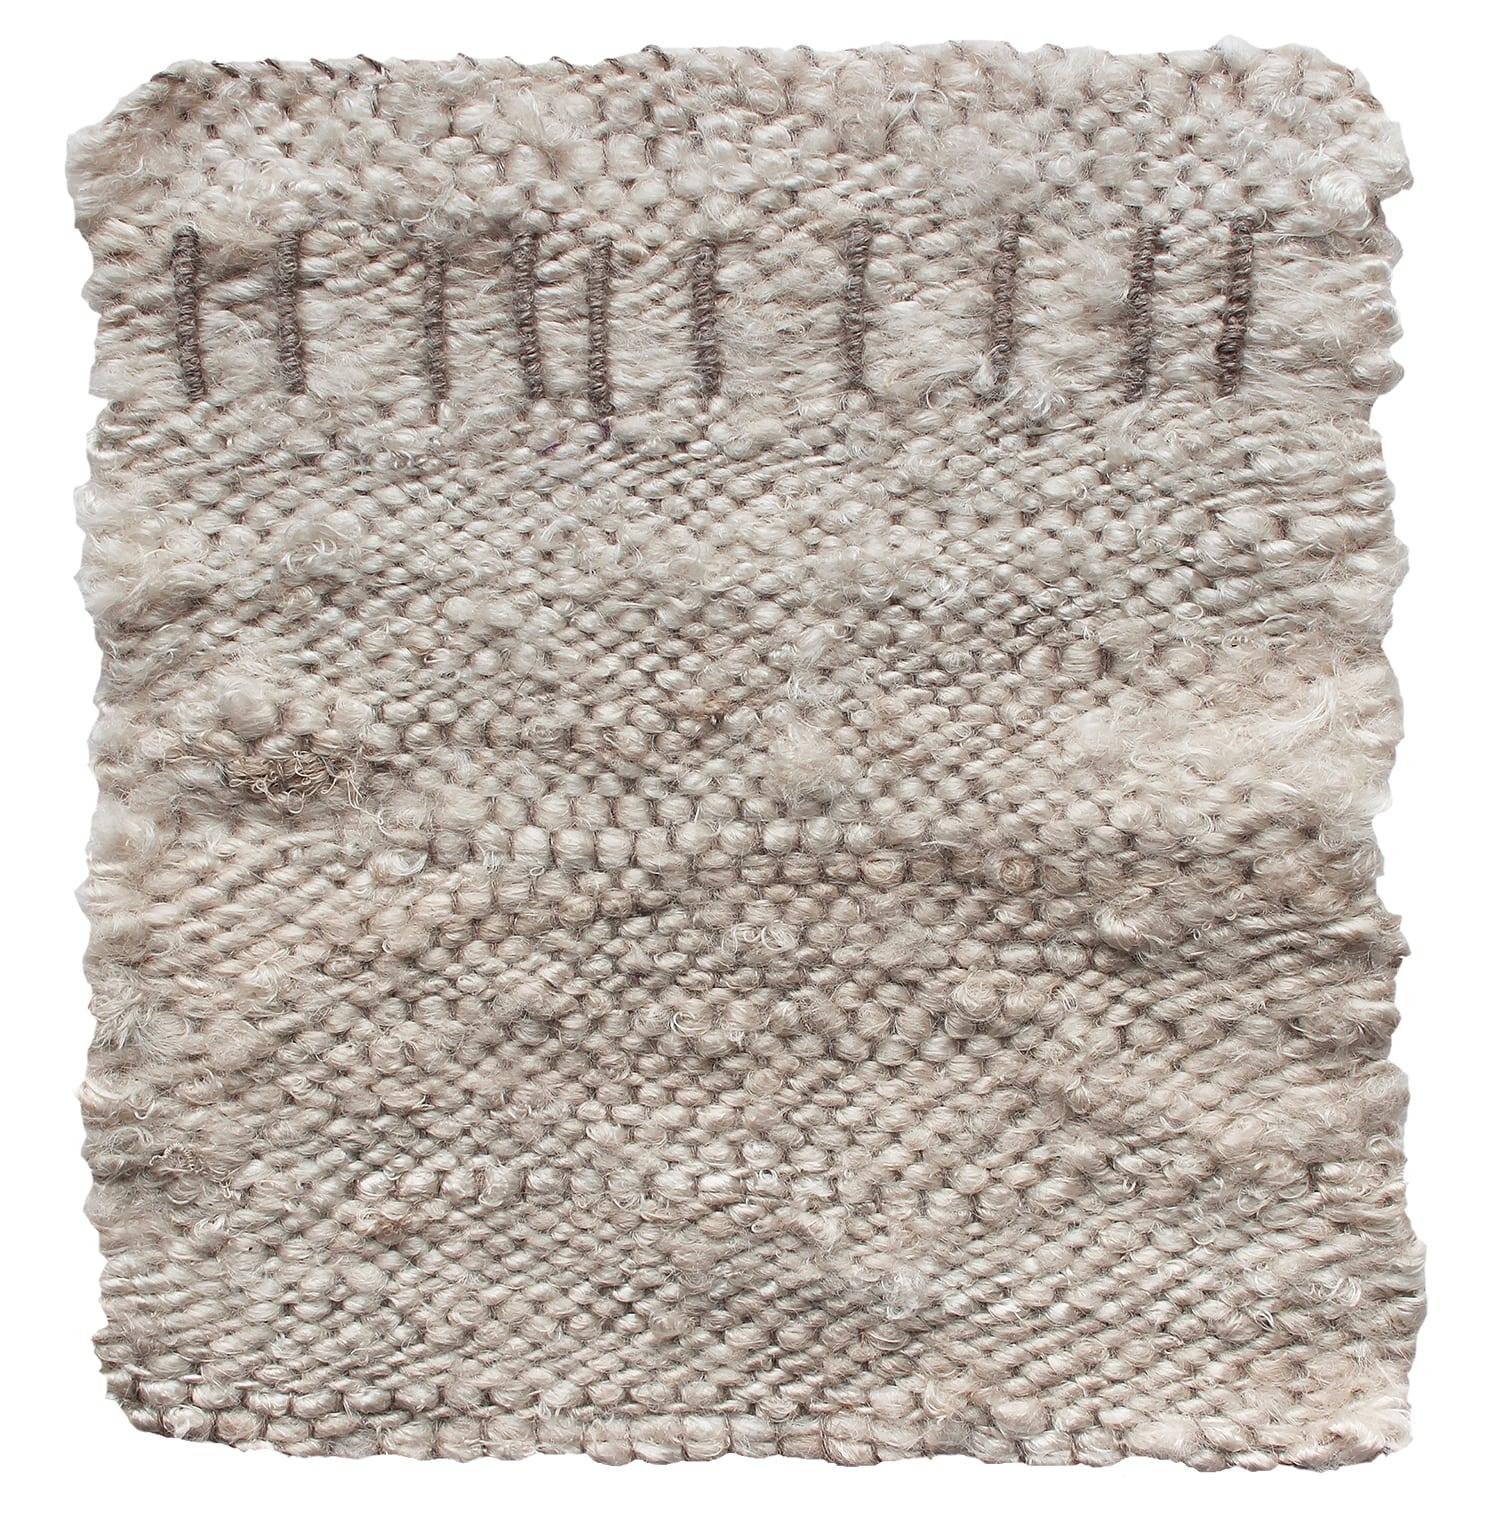 10-wrapped-lines-grey-silk-wool-min.jpg